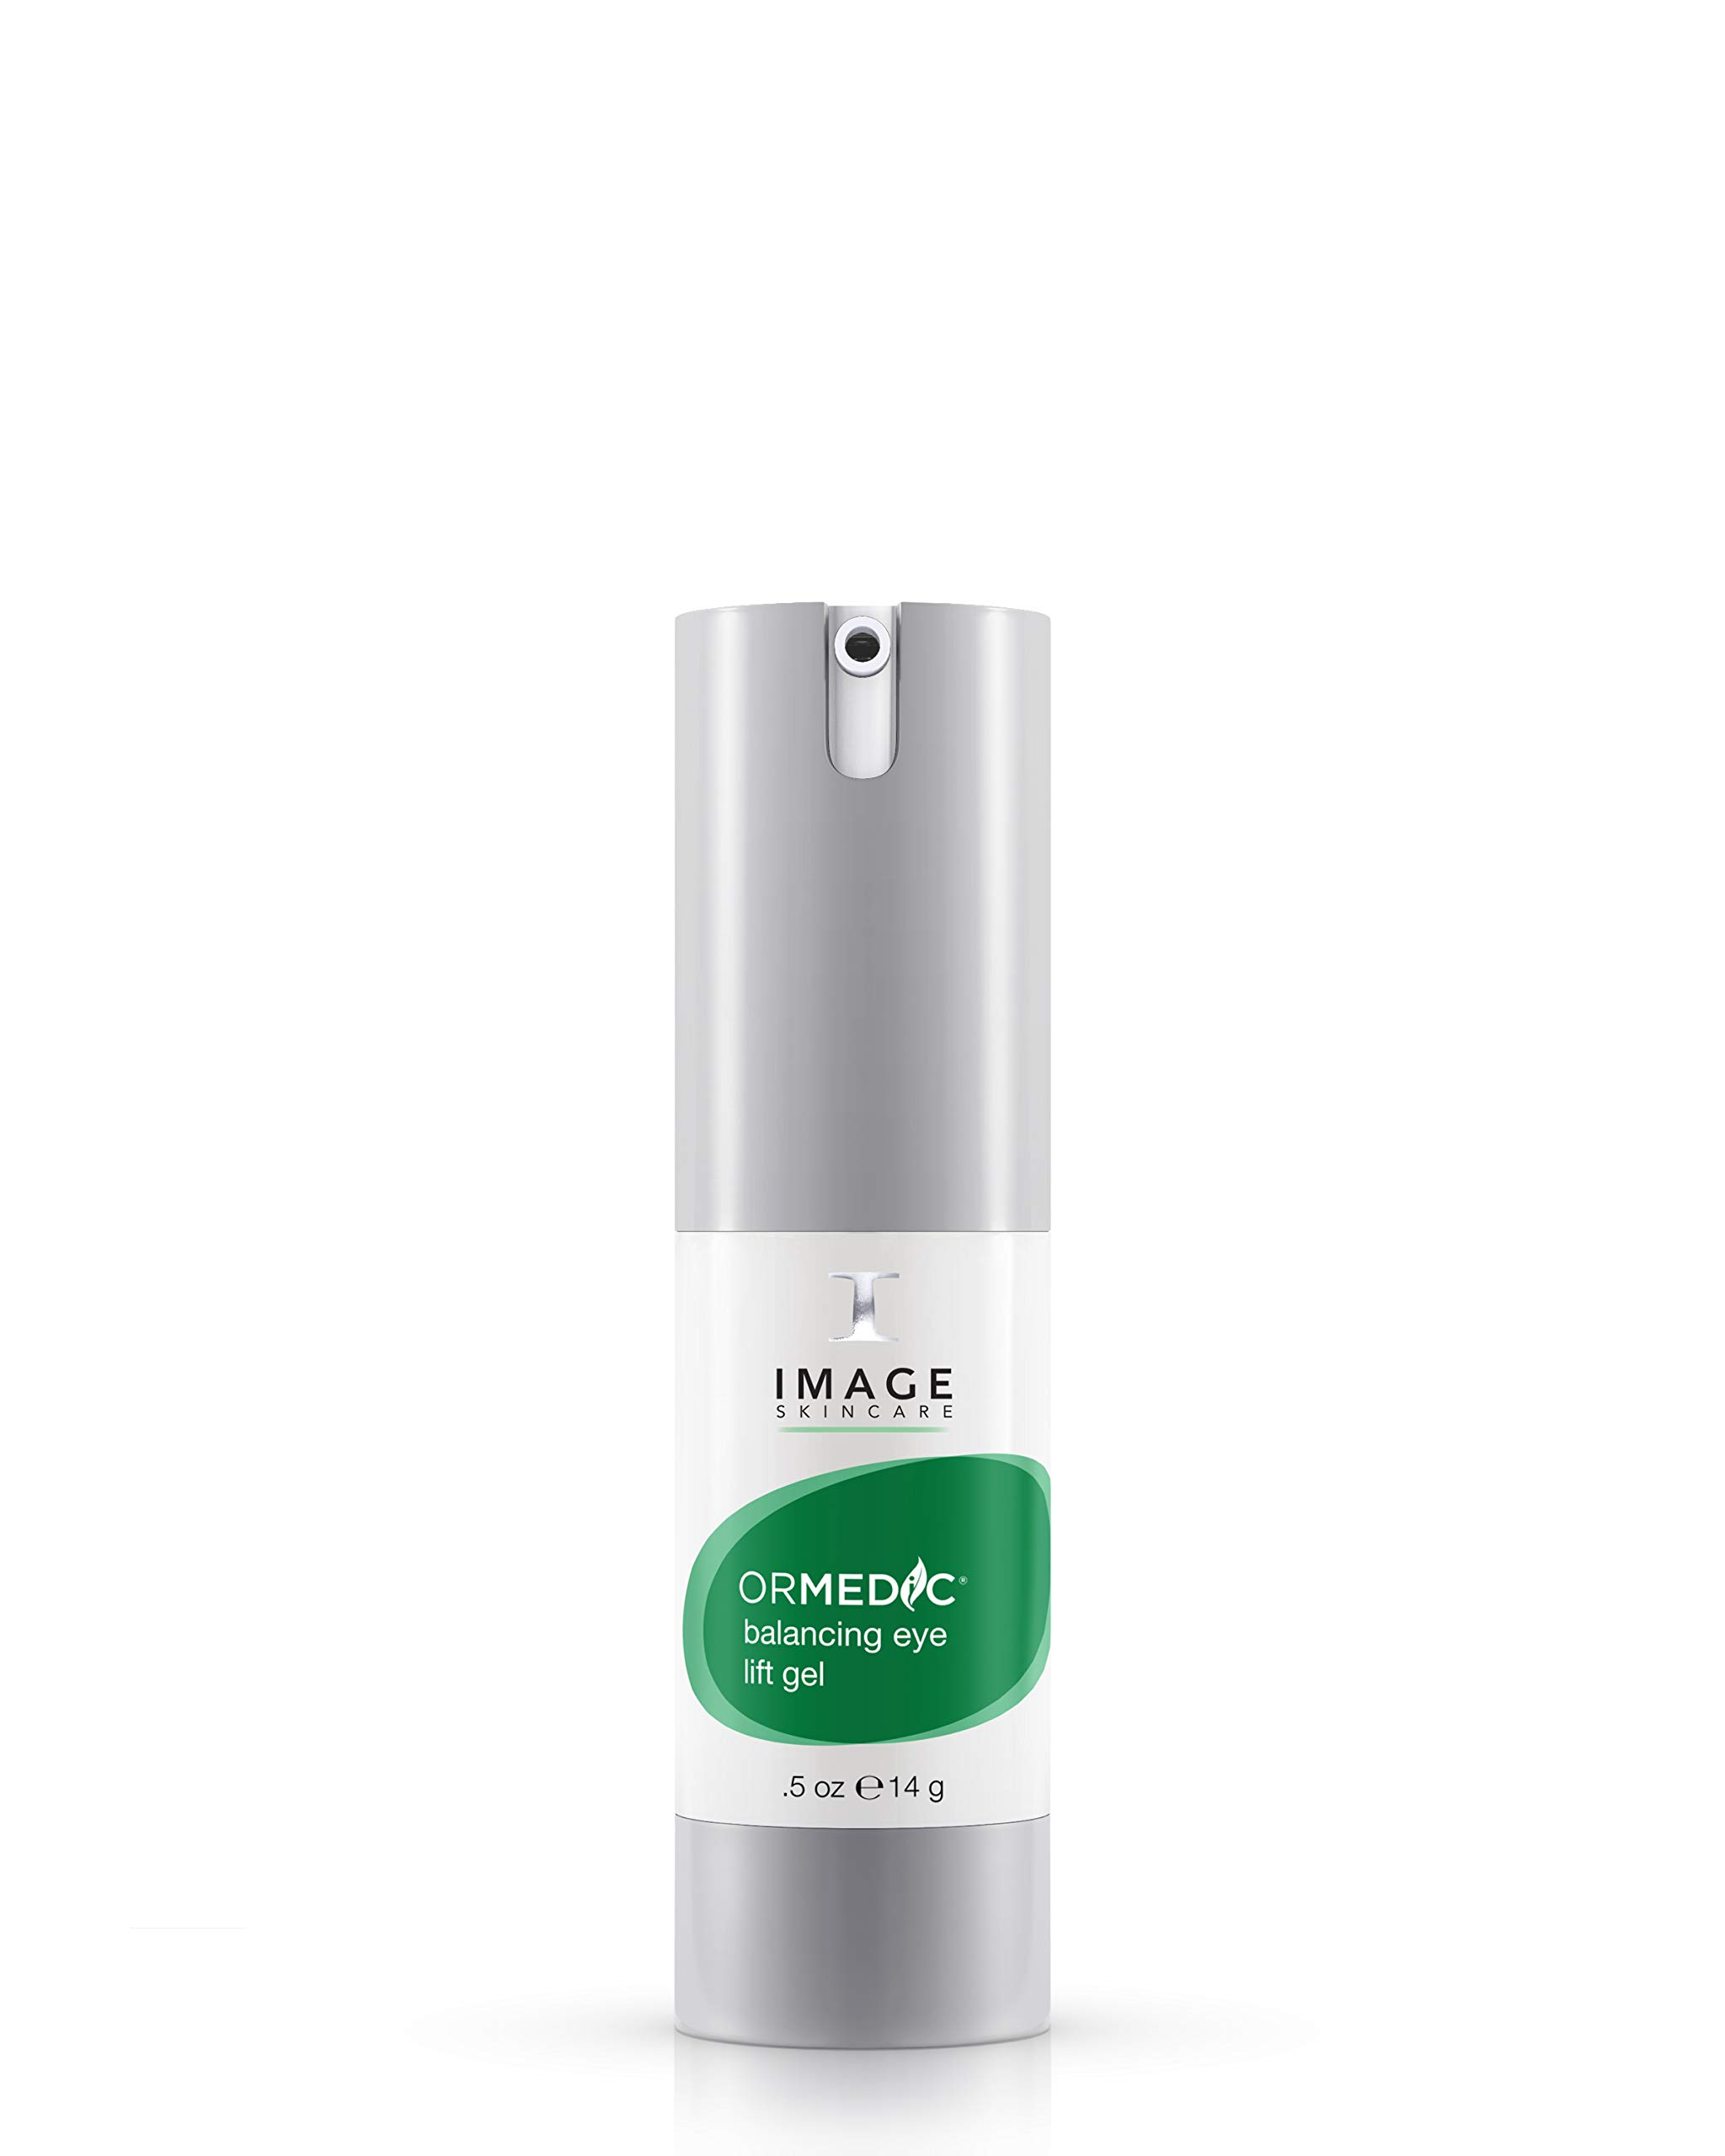 IMAGE Skincare Ormedic Balancing Eye Lift Gel with SCT, 0.5 Oz by Image Skincare